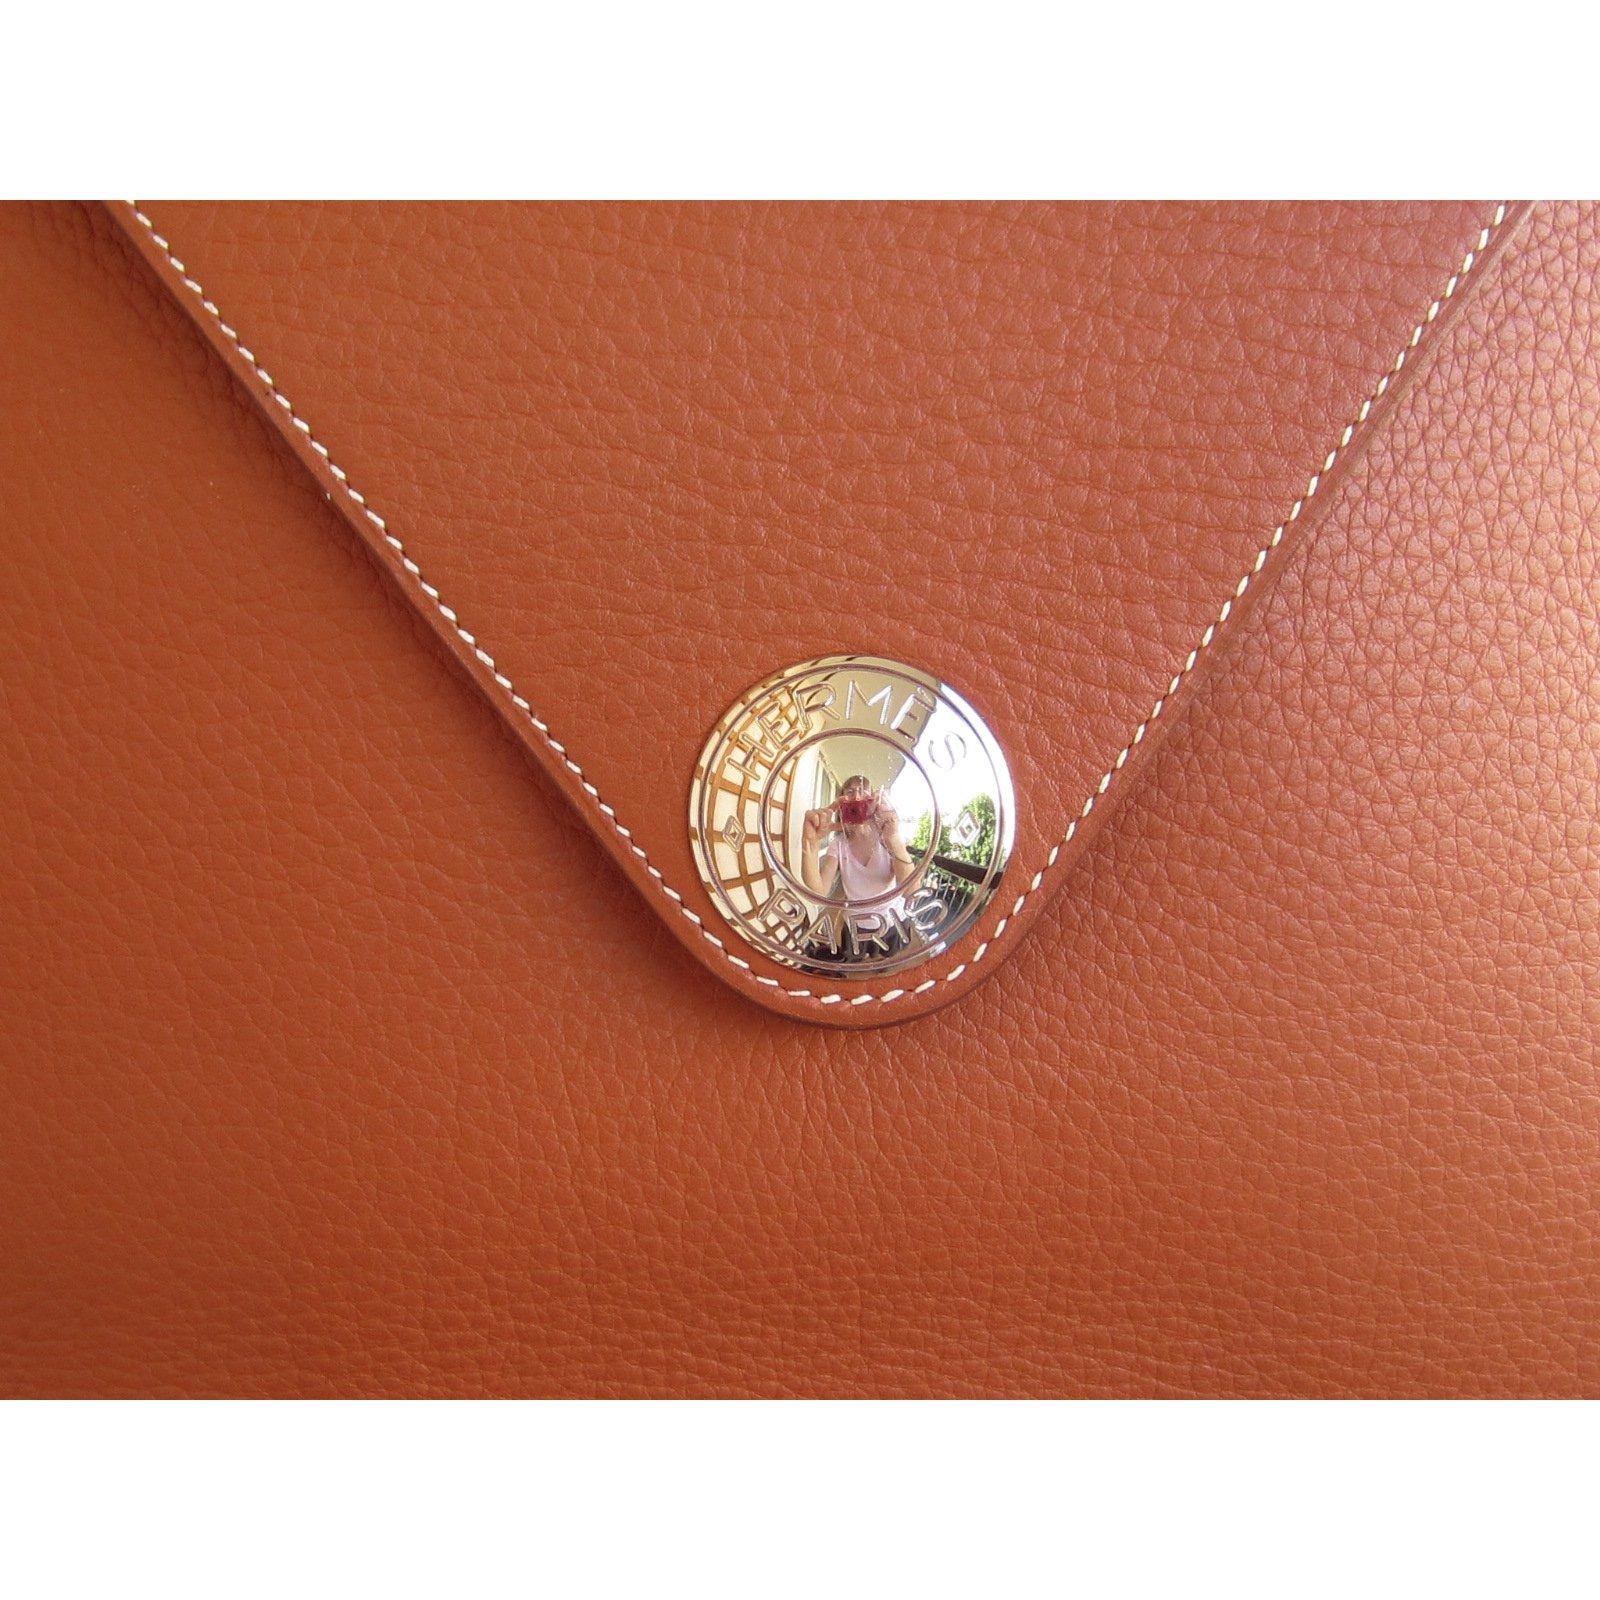 c452d1c0d542 Facebook · Pin This. Hermès Christine 35 cm Handbags Leather Red ...